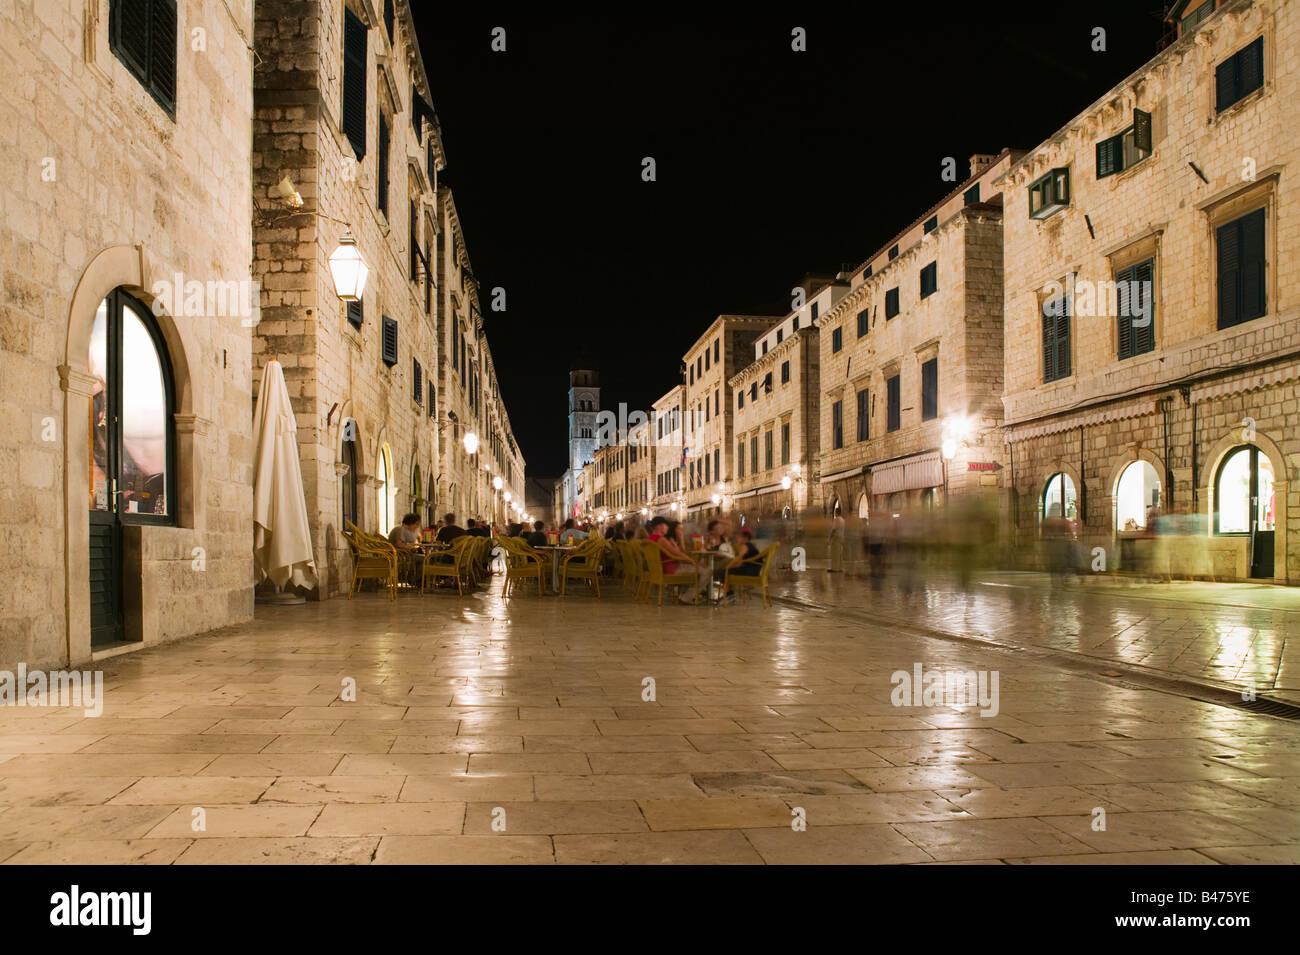 Street in dubrovnik old town - Stock Image